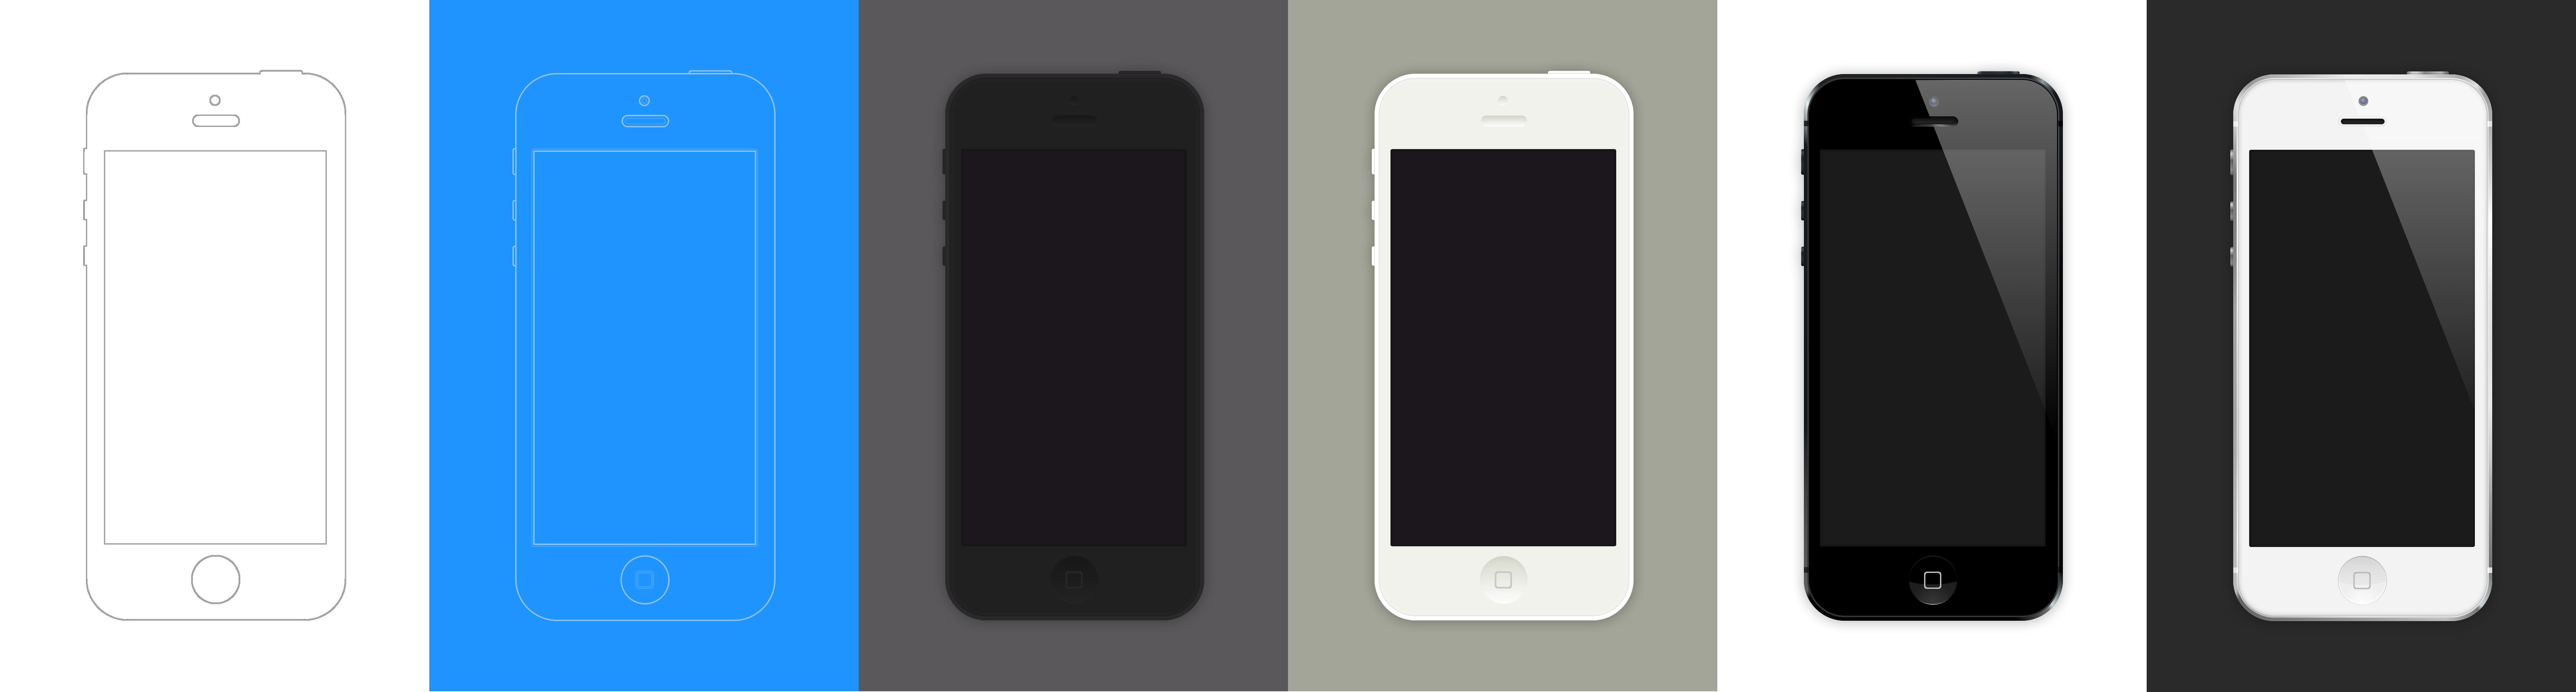 iPhone 5 .Sketch Template via Dribbble | @thetorquemag